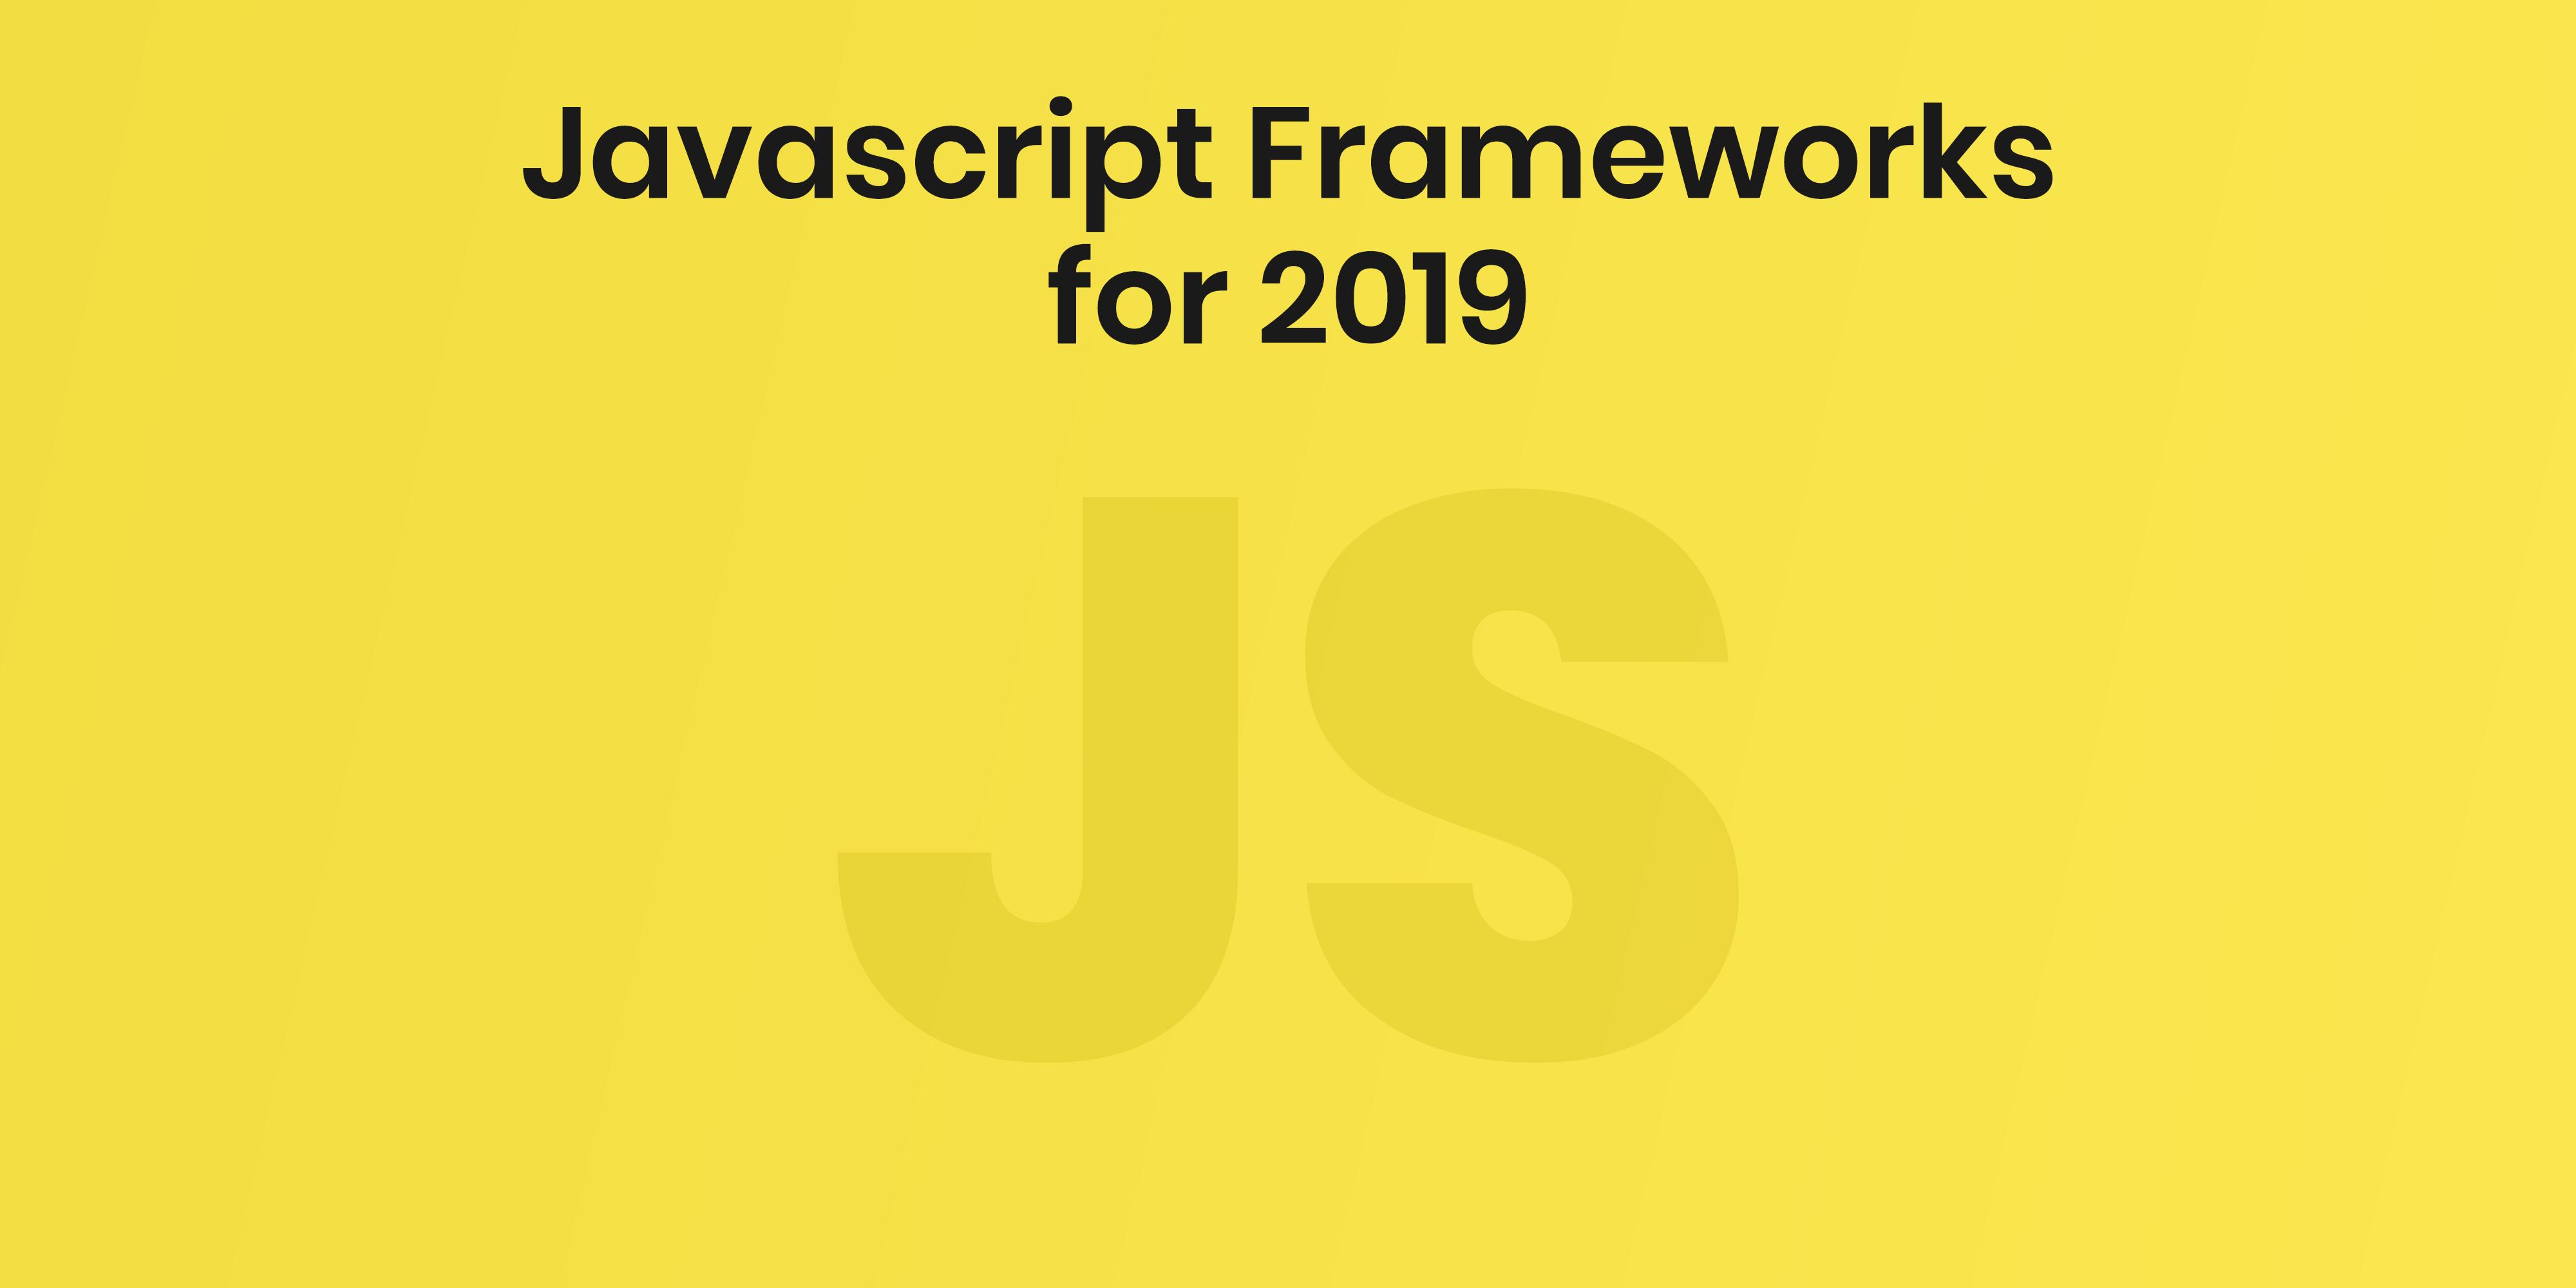 Do we still need JavaScript frameworks?